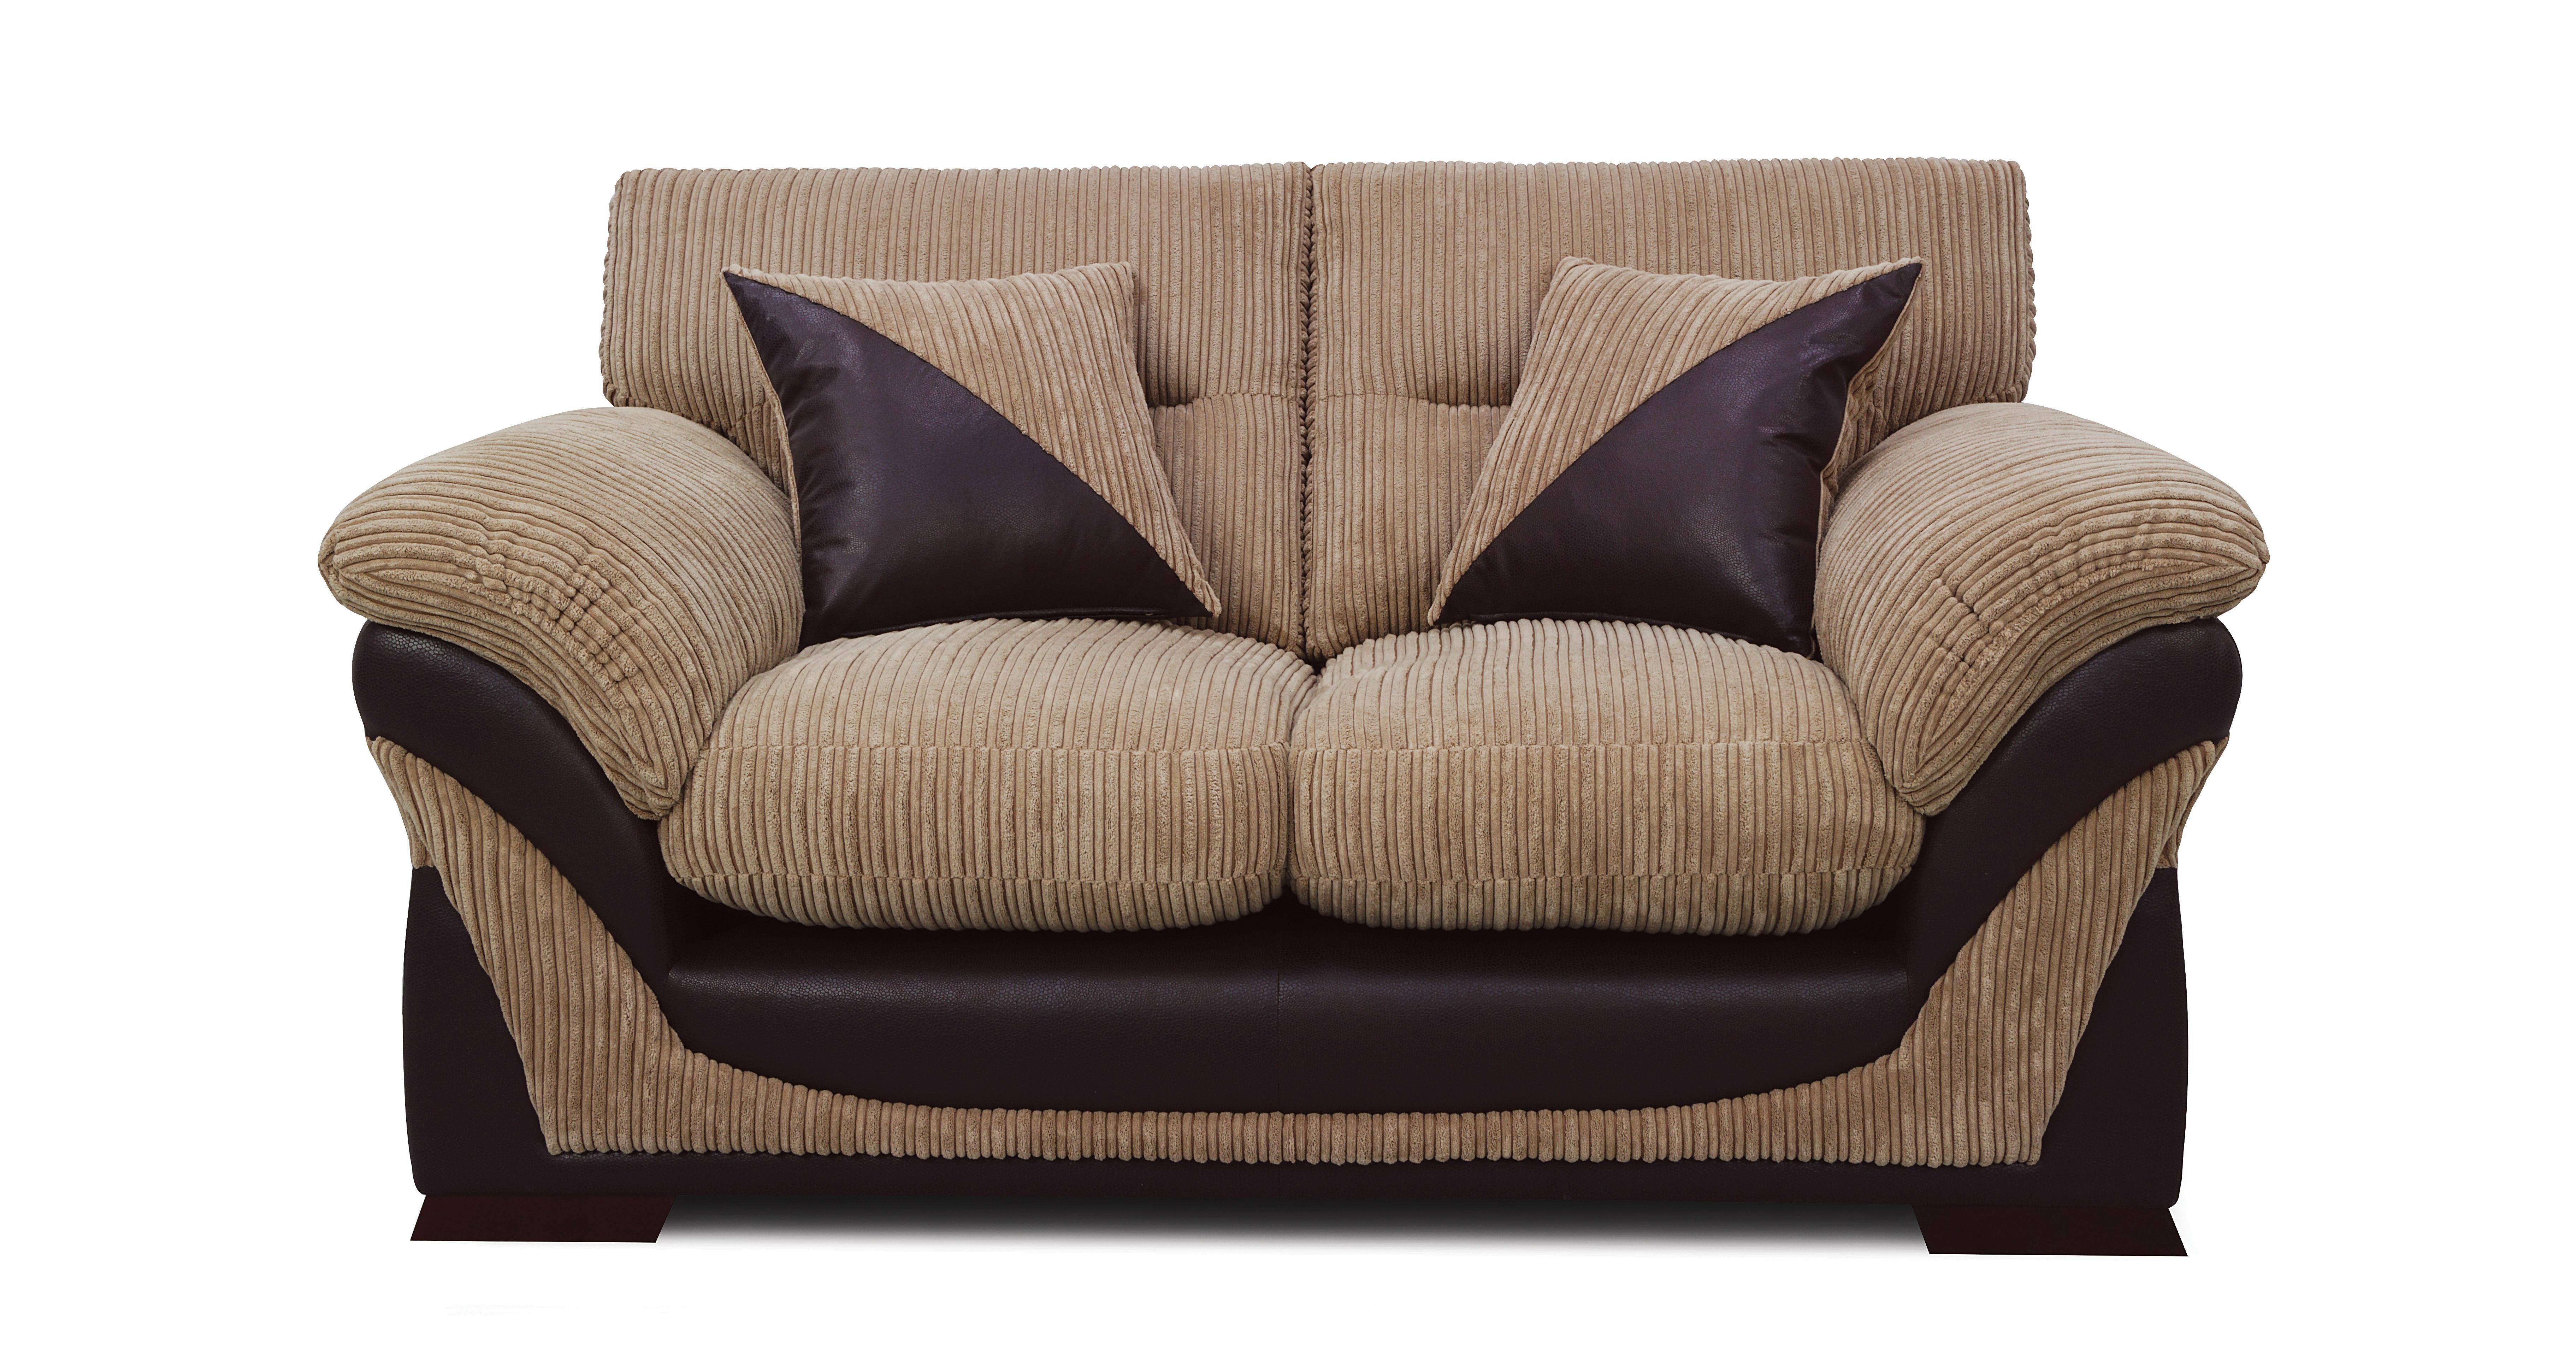 Telford Small 2 Seater Sofa Samson | DFS